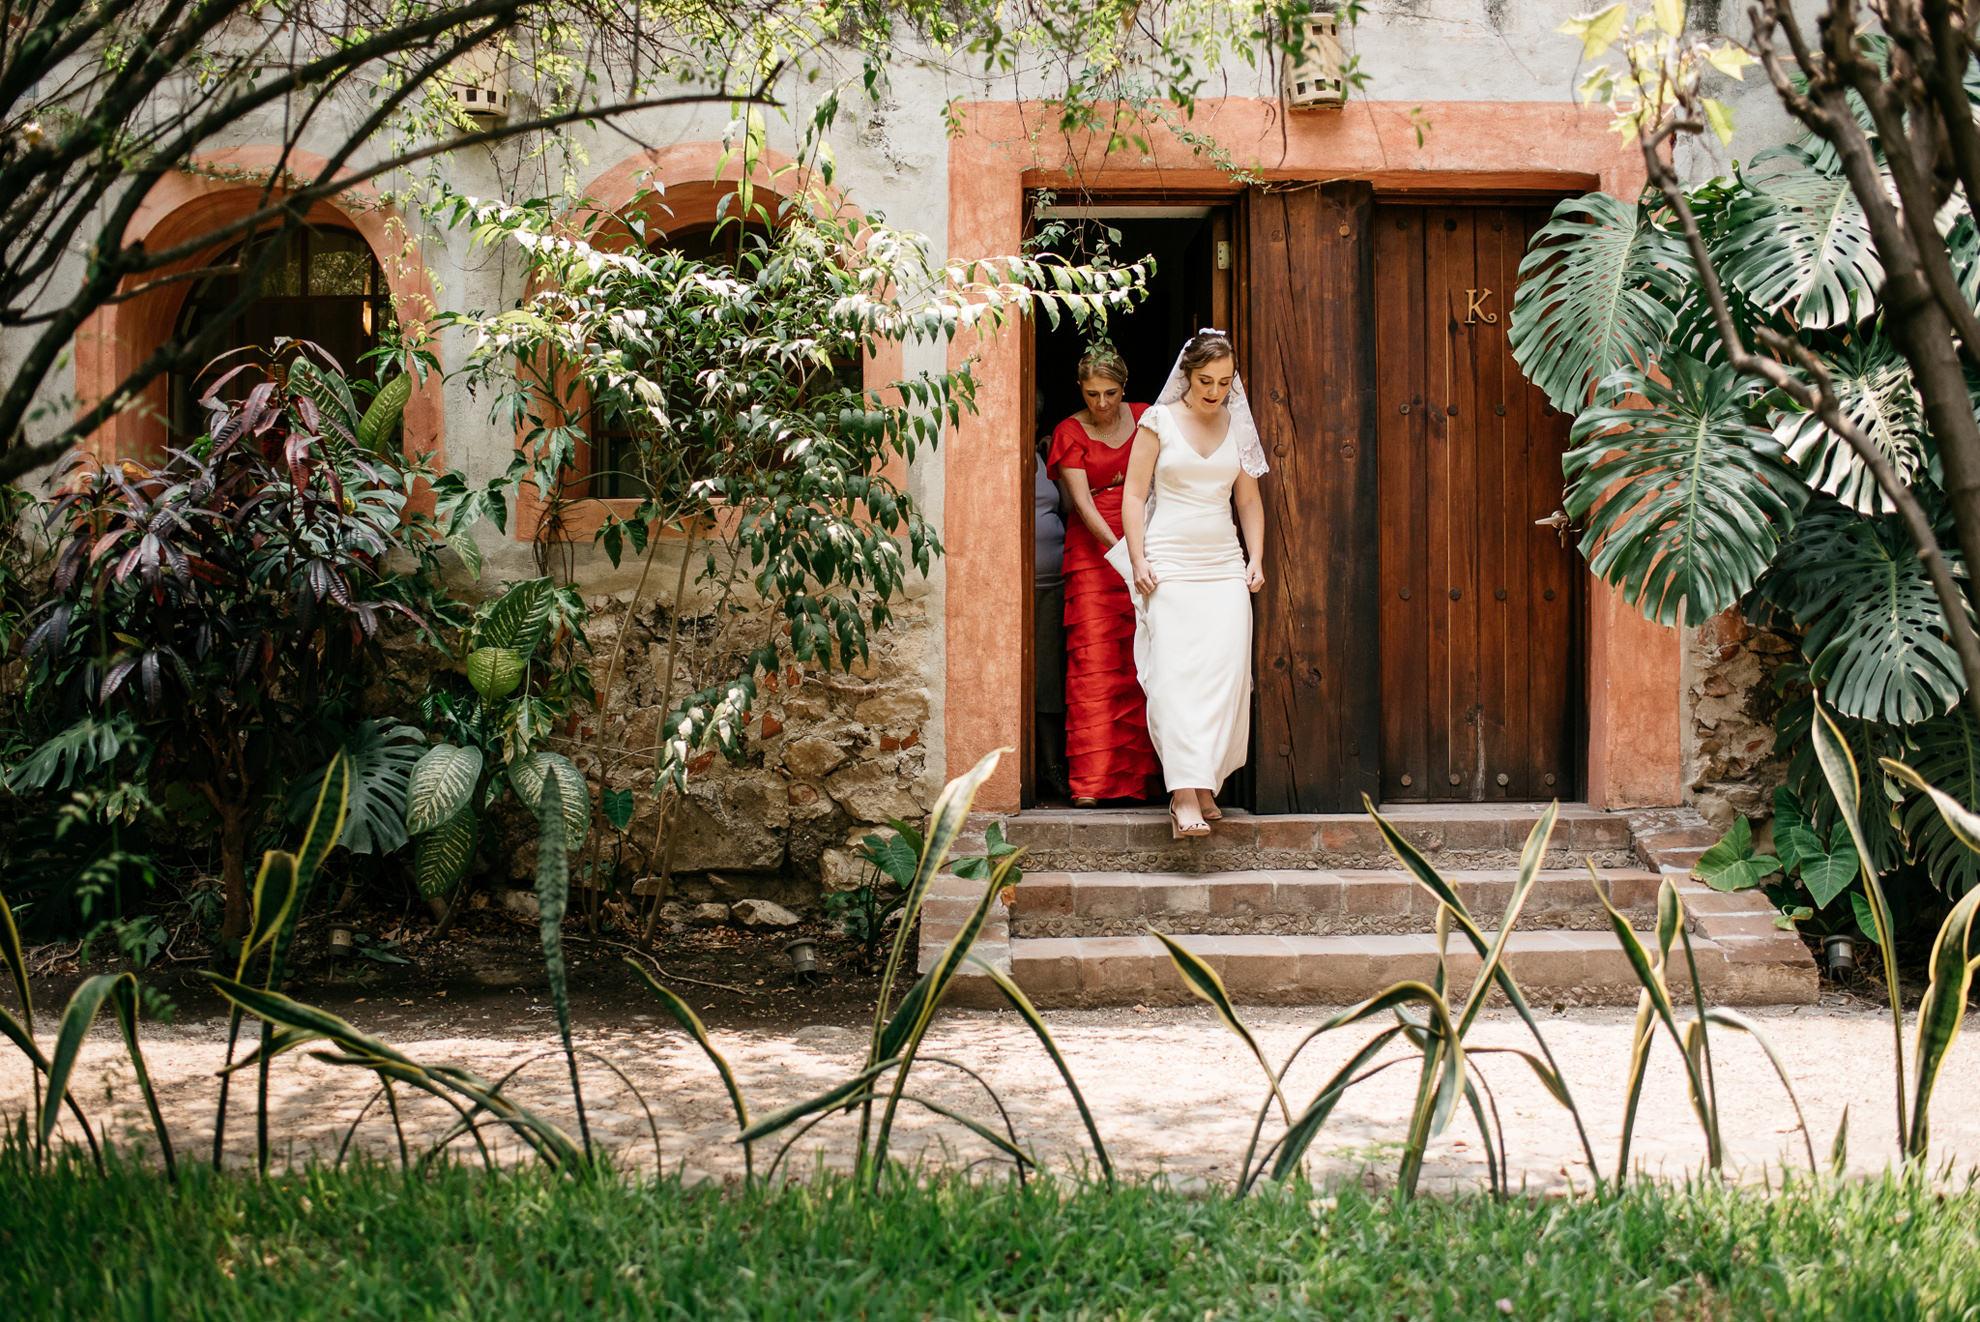 031 - hacienda san carlos.jpg